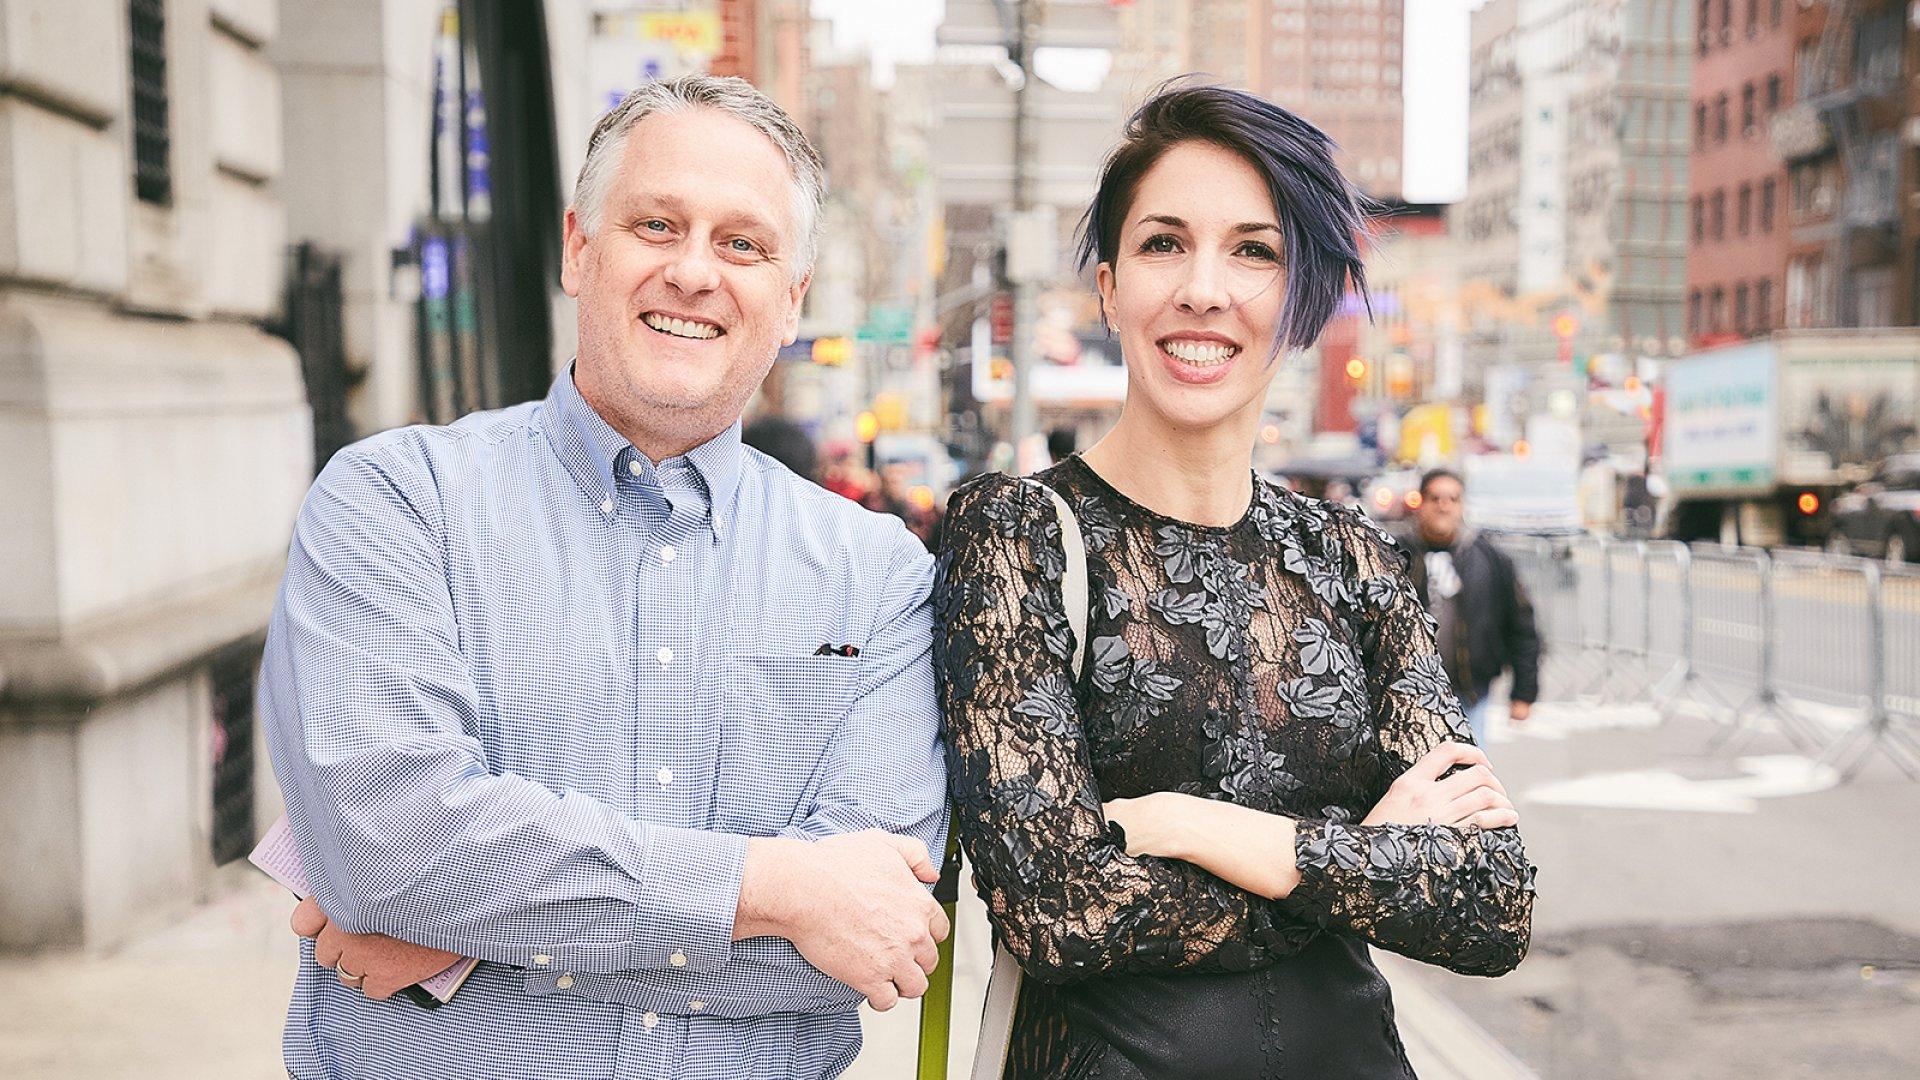 Rob Marsh (left) and Kira Hug, the founders of The Copywriter Club.